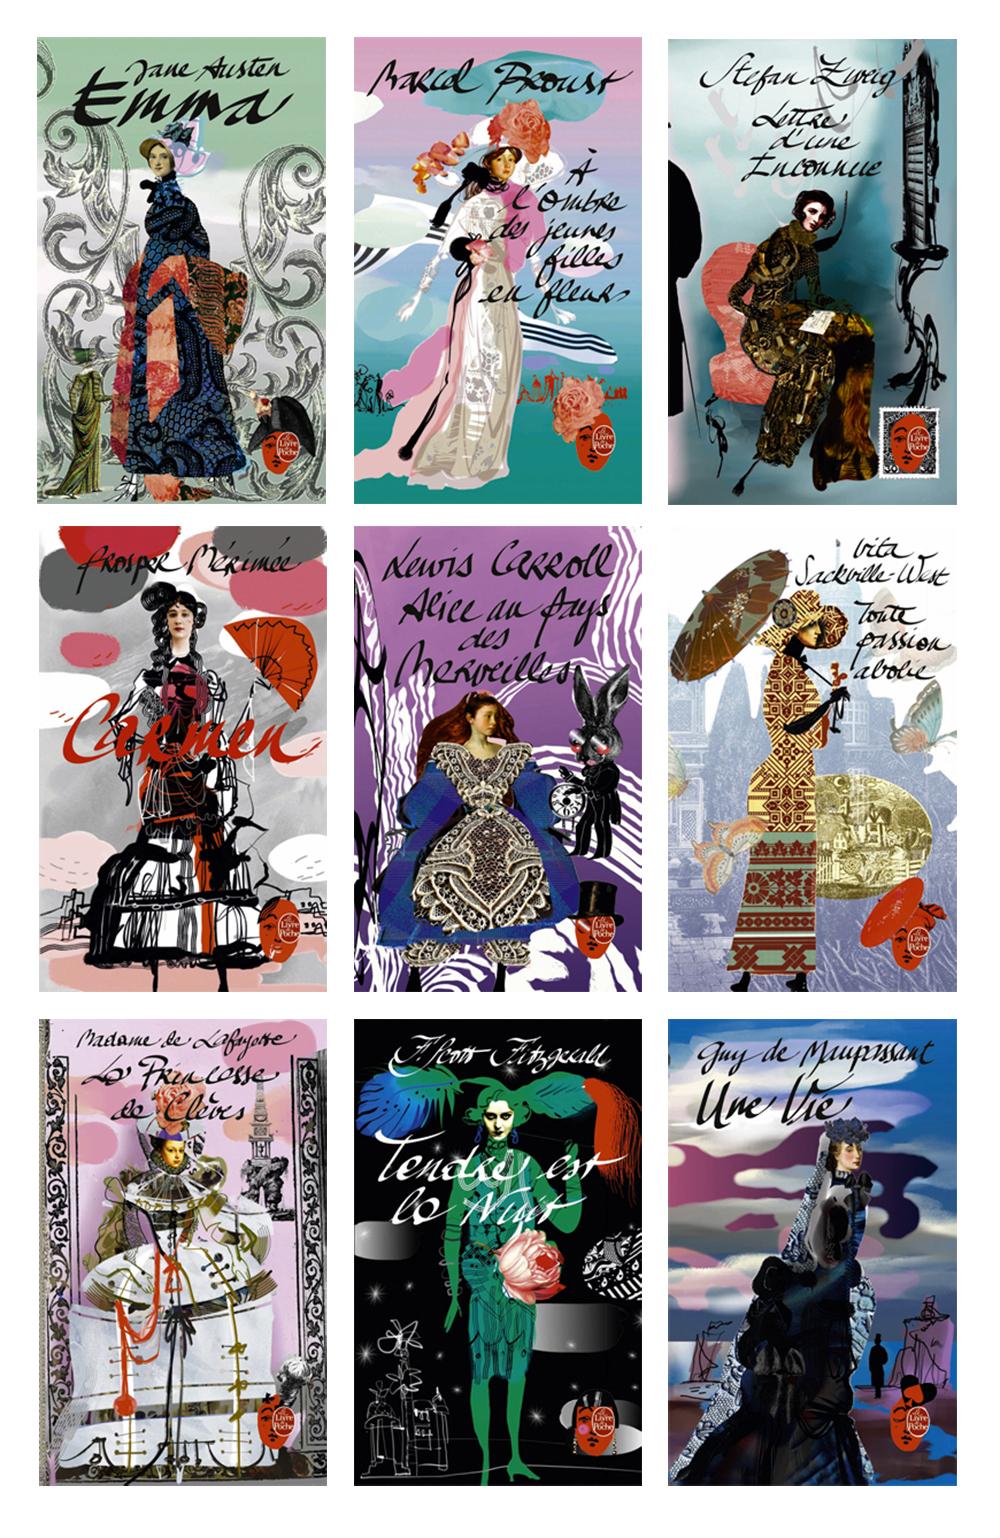 http://4.bp.blogspot.com/_QHHGNPnbJNE/TTAZJzxbwbI/AAAAAAAABEI/oVRqoRmpY4o/s1600/Christian+Lacroix+for+livres+de+poches.jpg